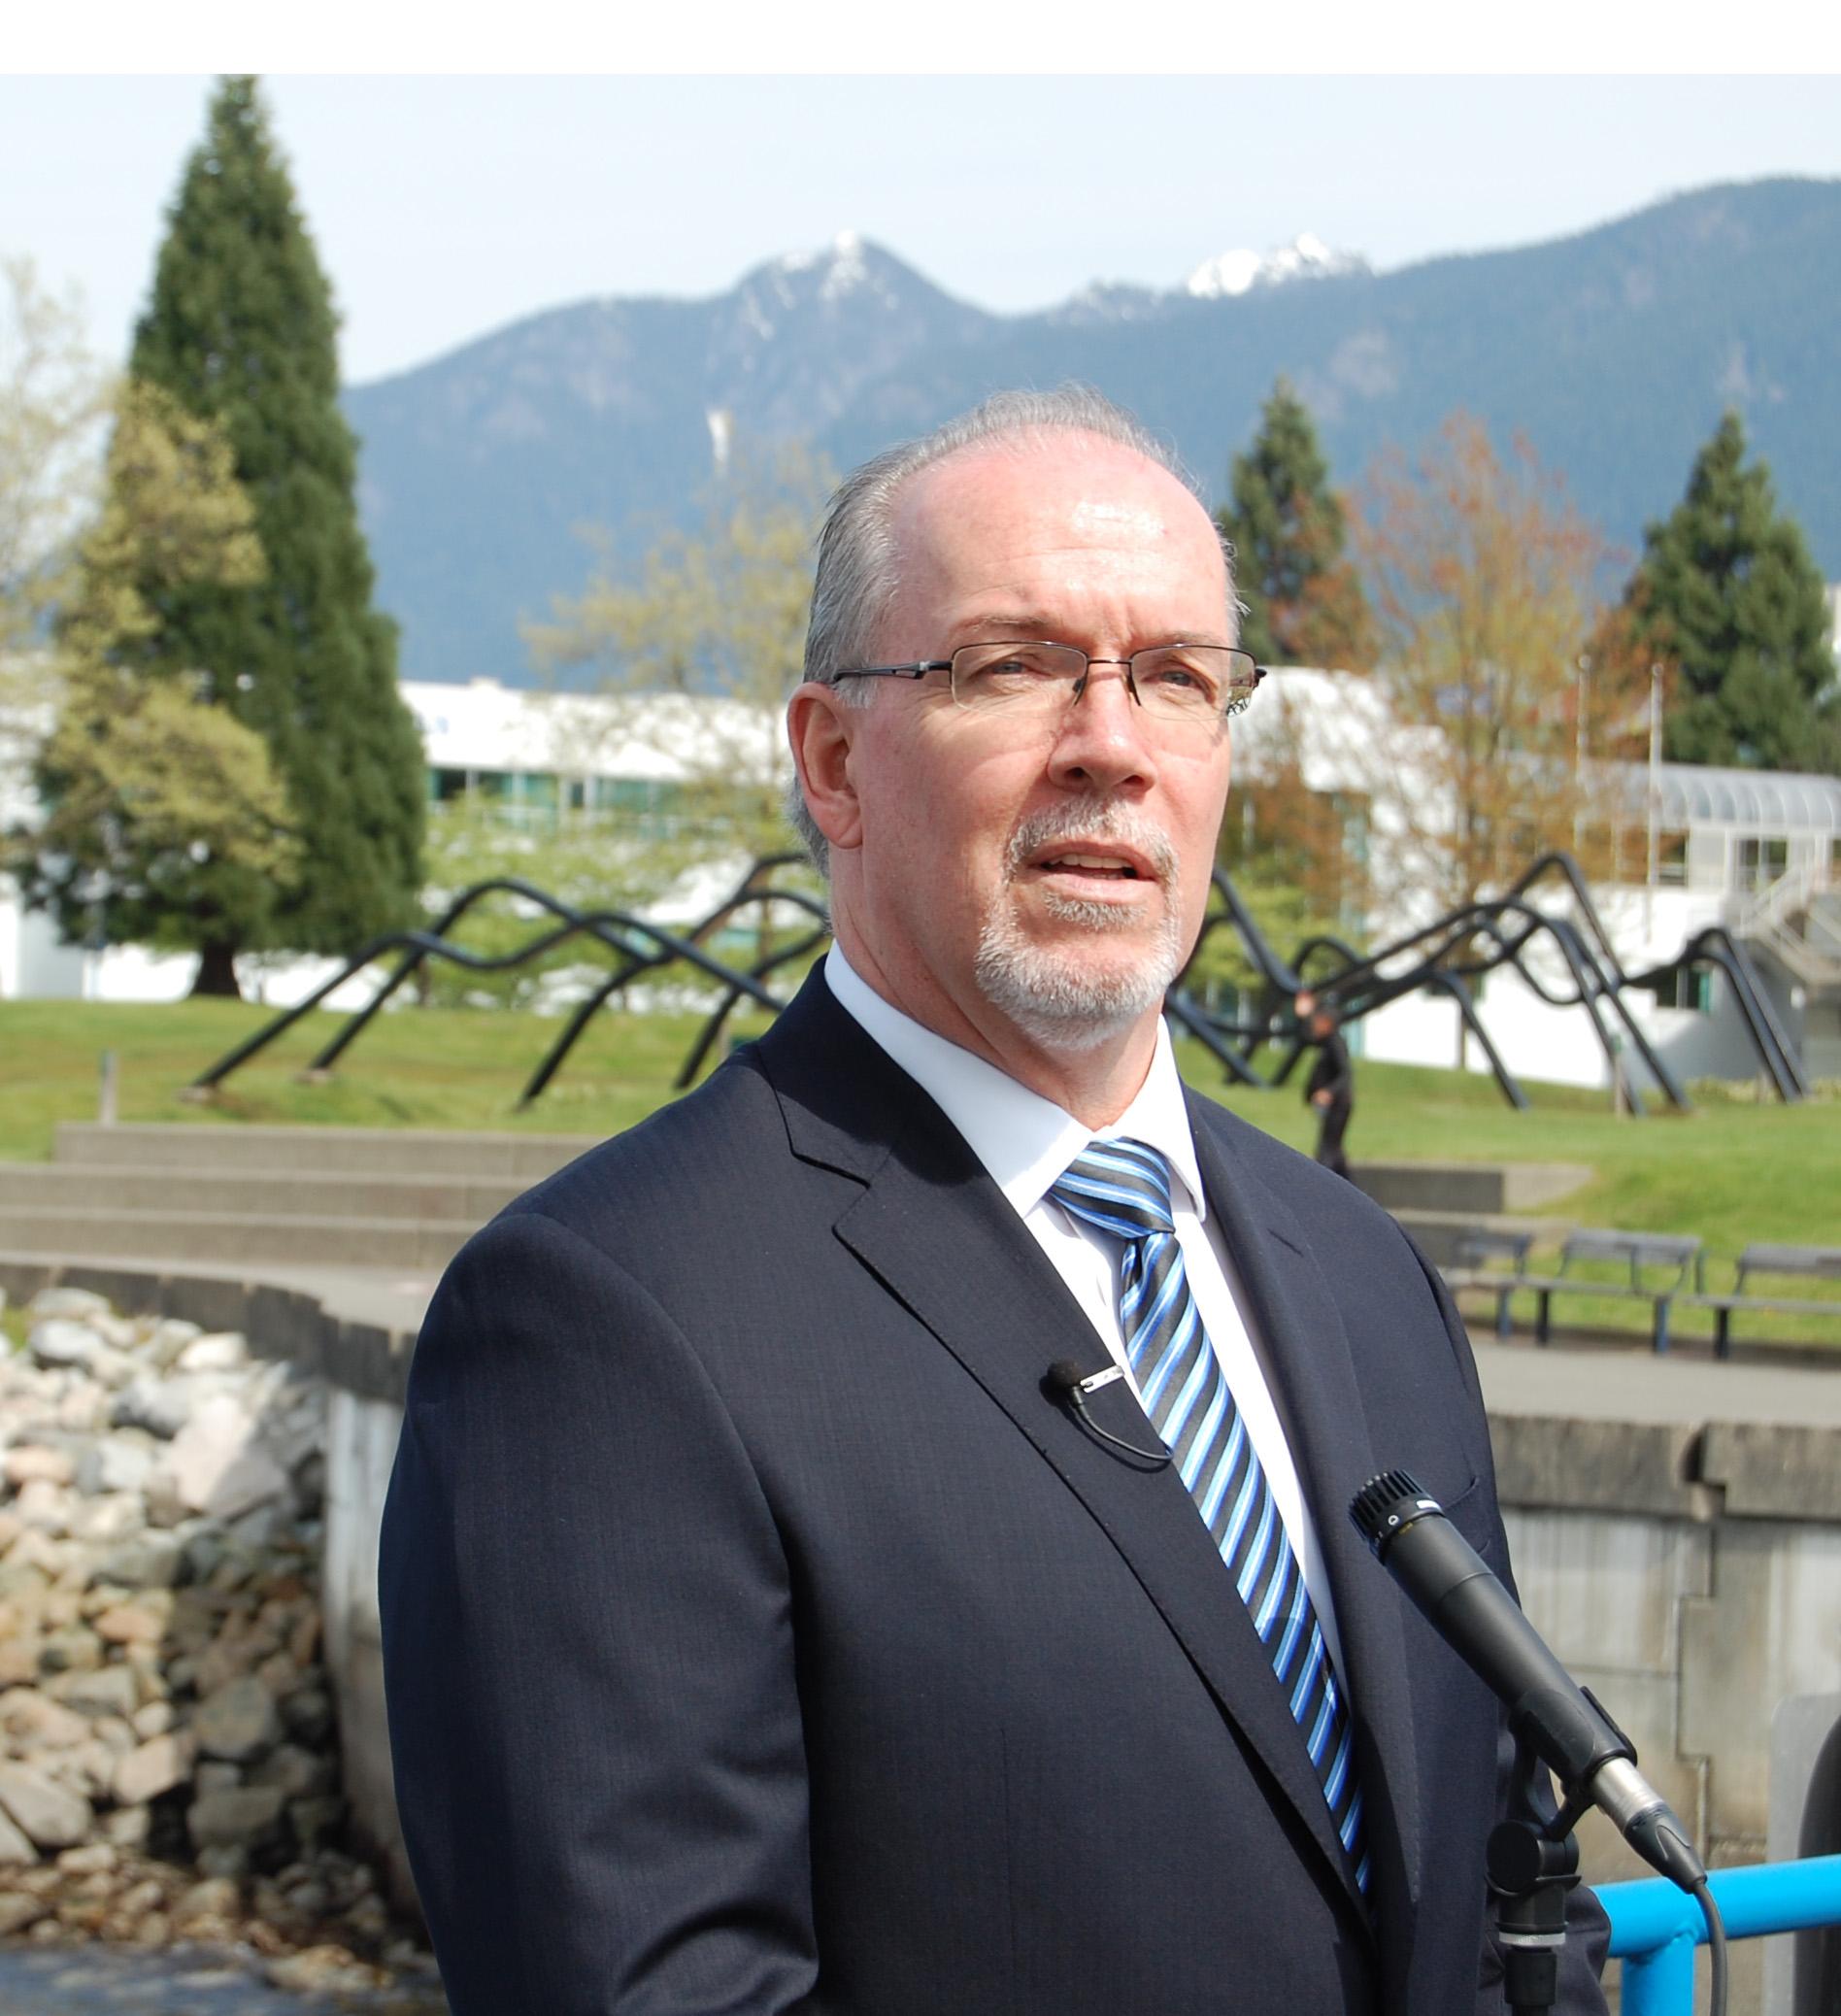 John Horgan, Leader, BC NDP